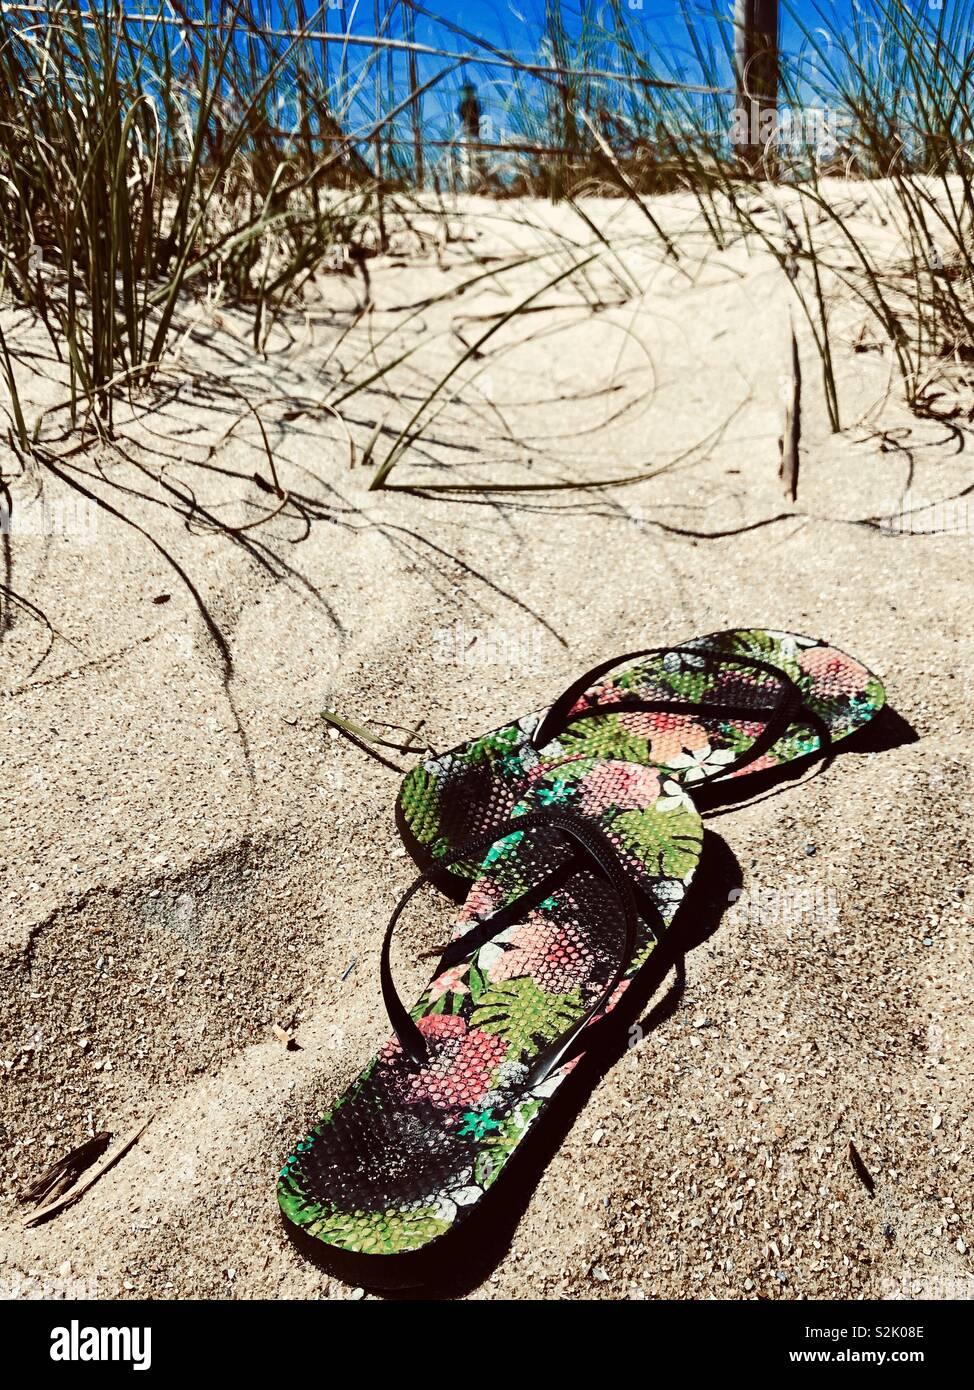 Flip flops on beach - Stock Image